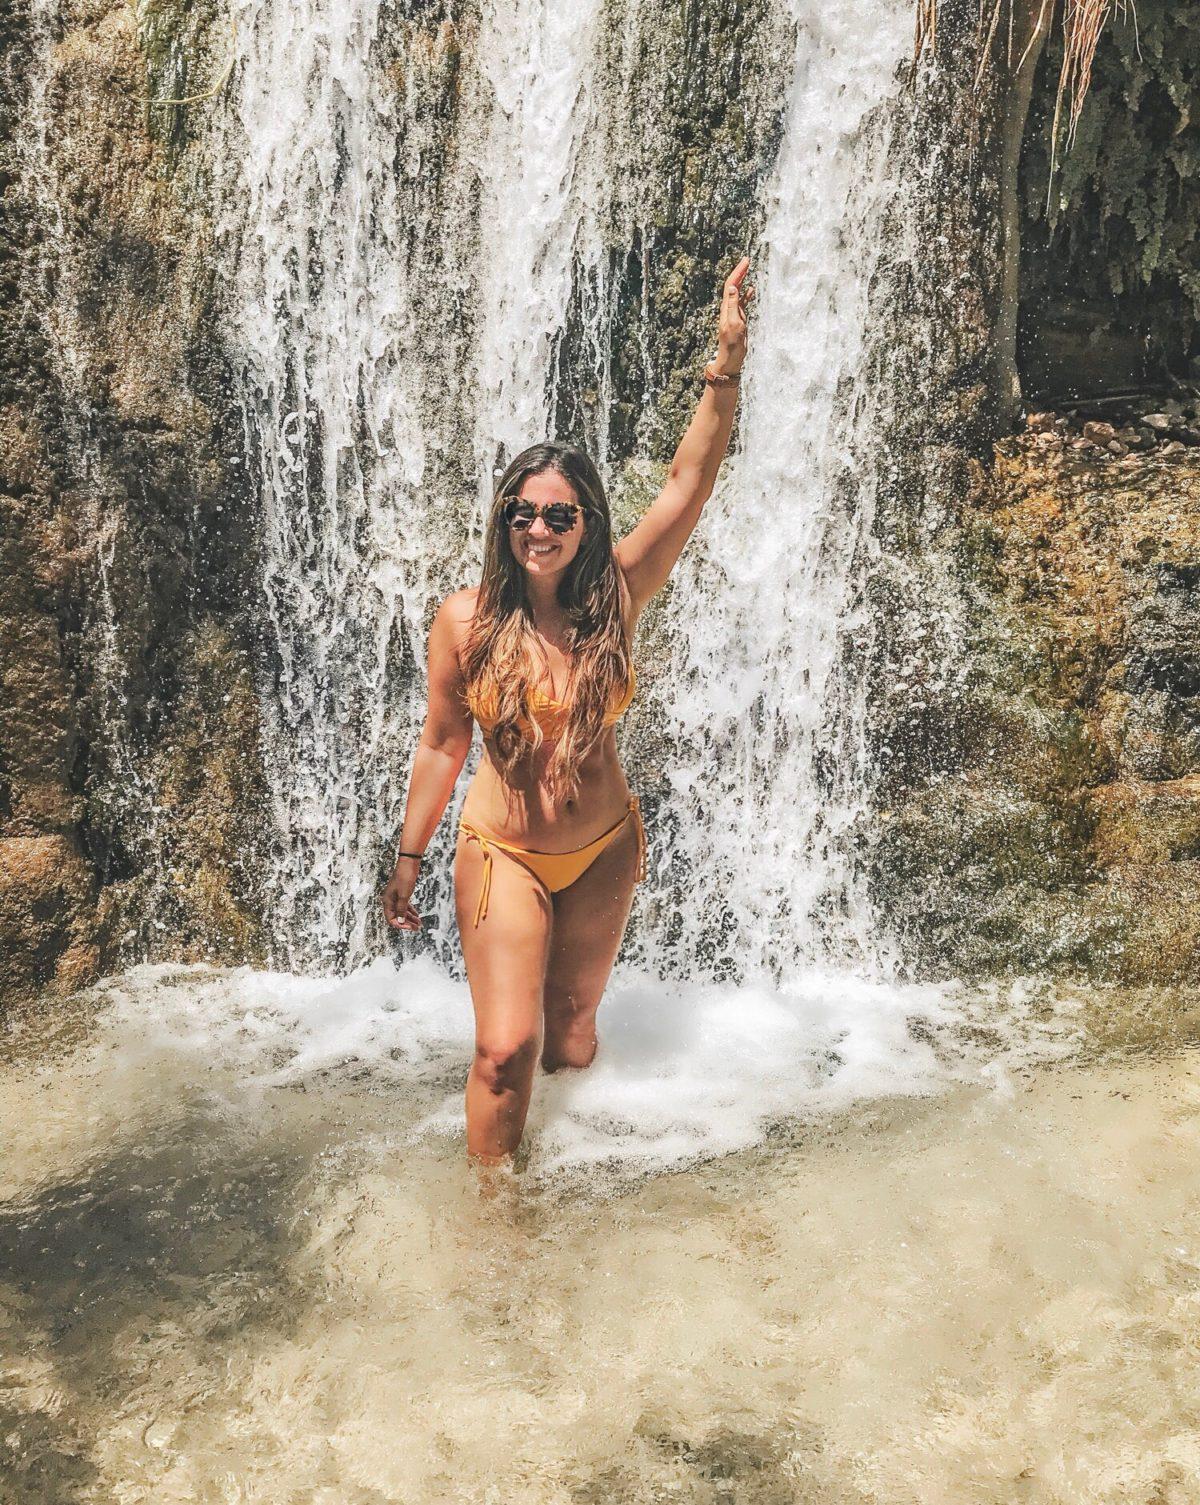 Ein Gedi waterfalls, Israel